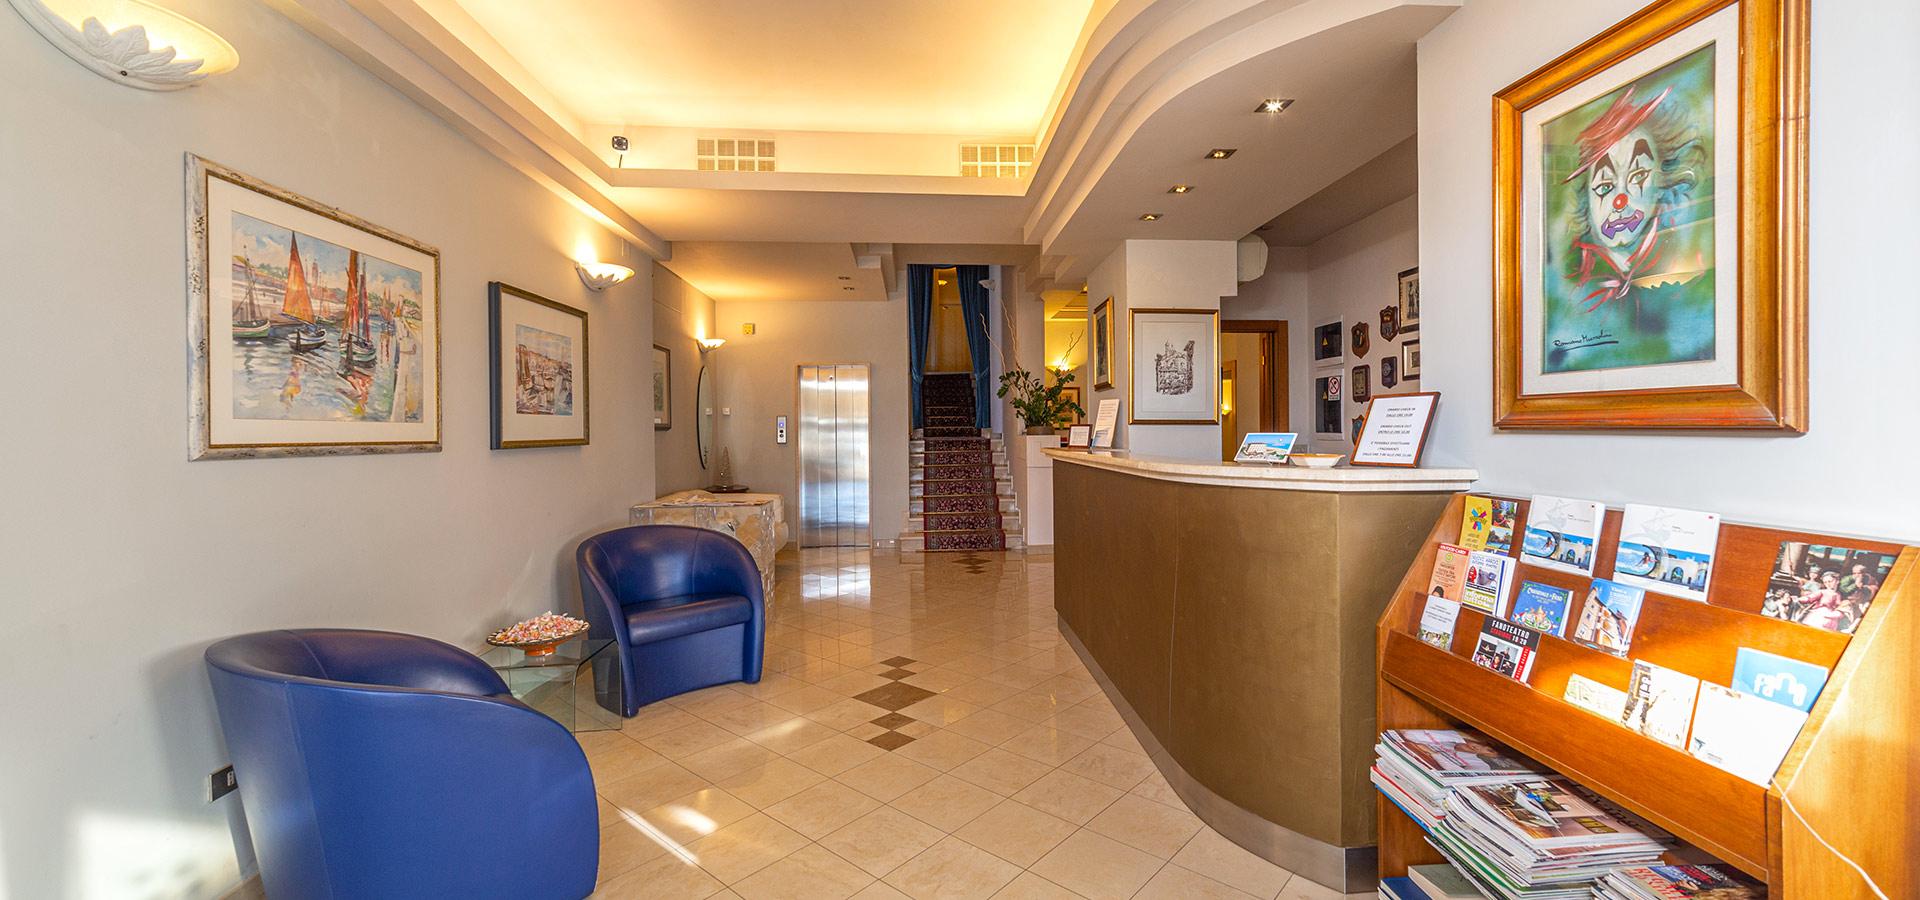 Hotel Cristallo slide 3